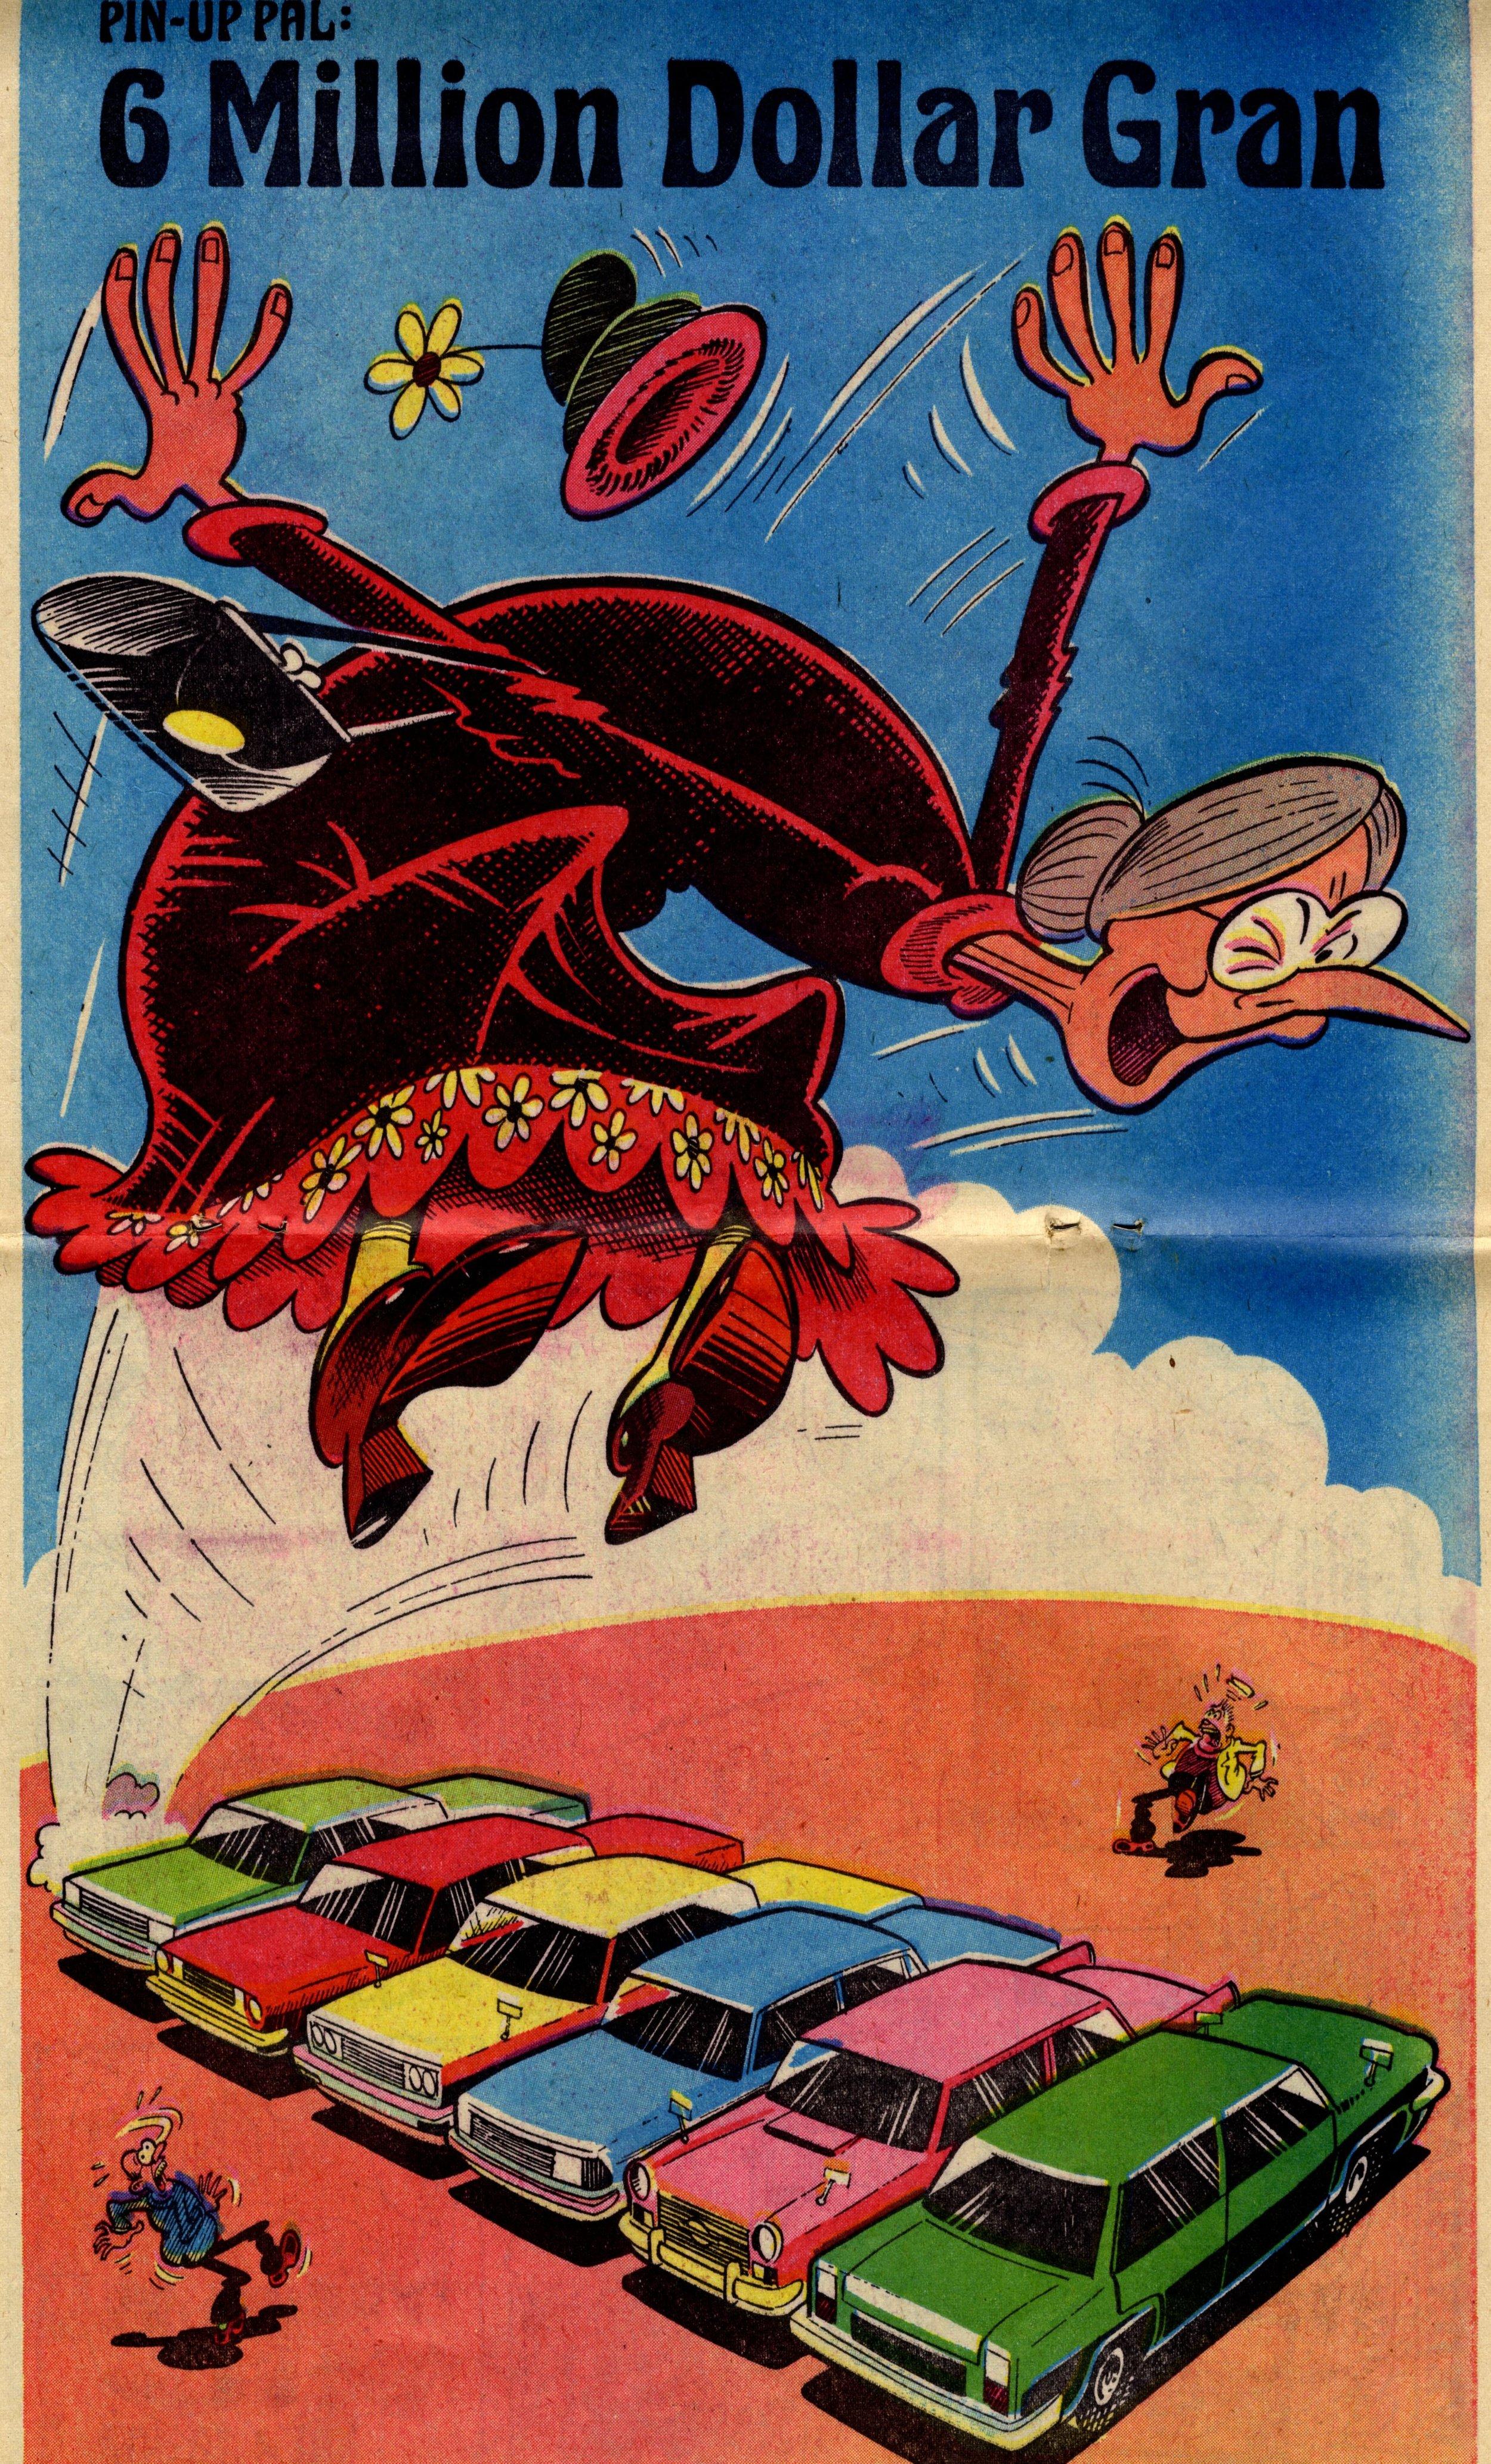 Pin-up Pal: 6 Million Dollar Gran (artist Ian Knox), 29 October 1977